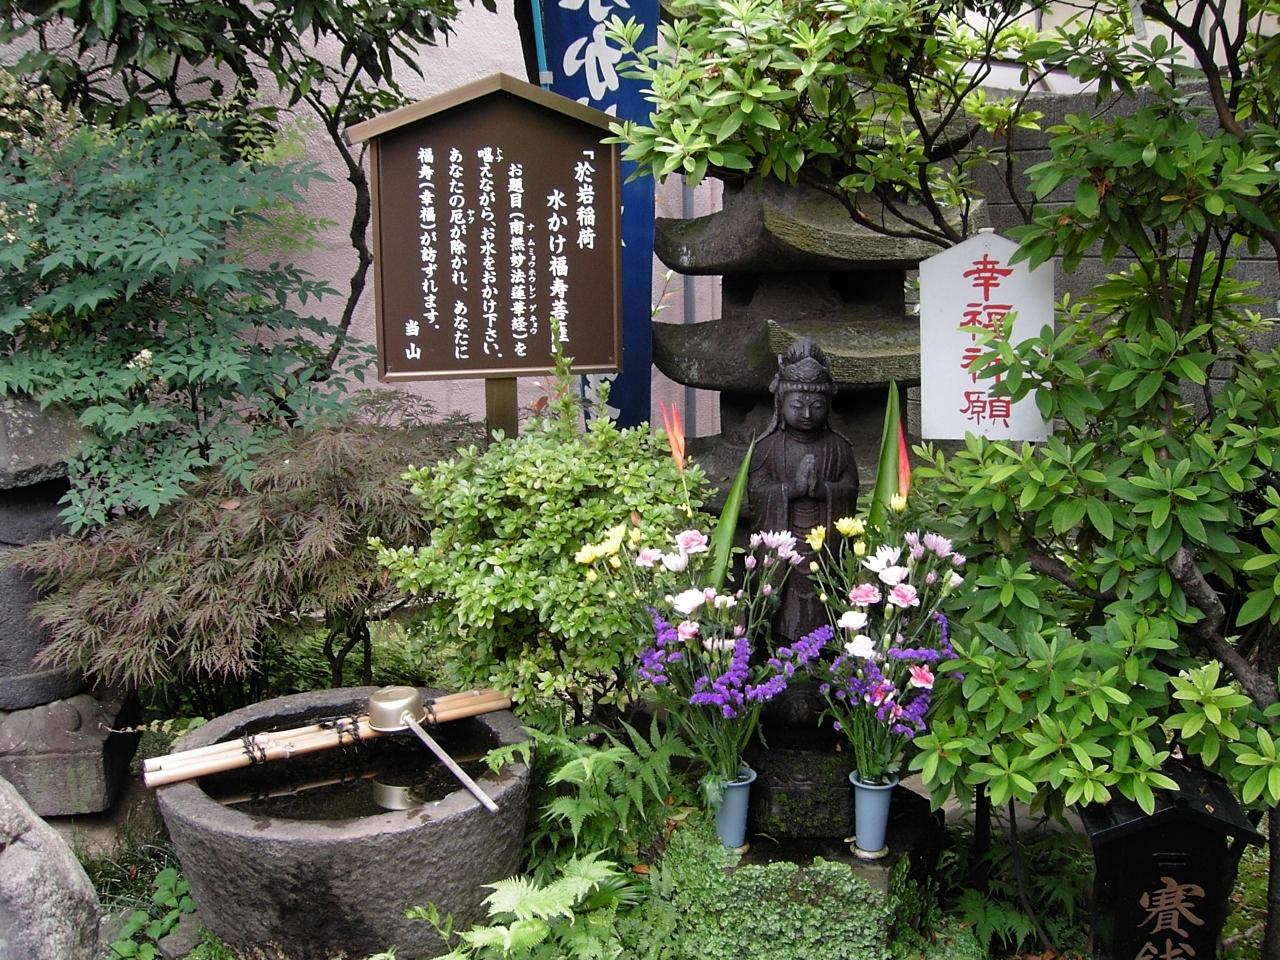 【16位】陽運寺 / 四ツ谷